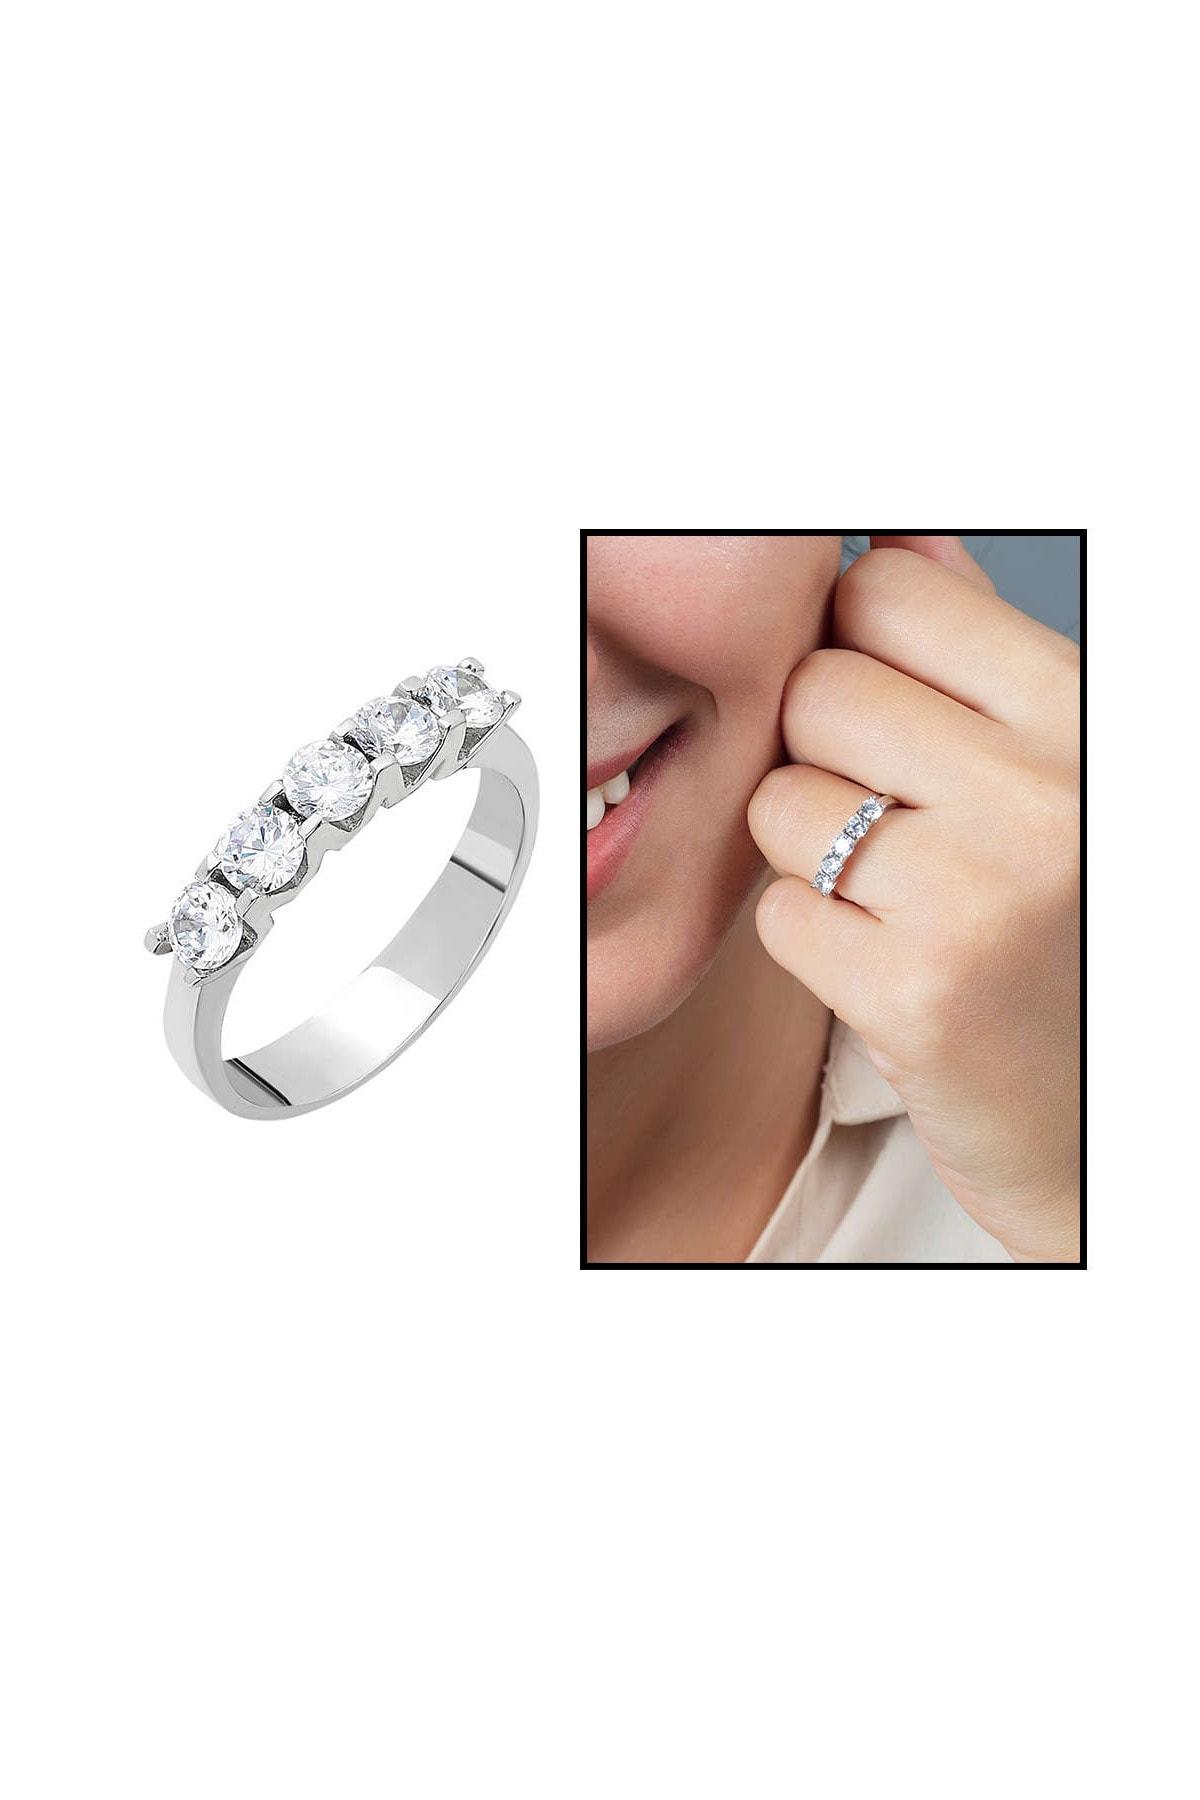 Tesbihane Starlight Diamond Pırlanta Montür Mini Tasarım 925 Ayar Gümüş Bayan Beştaş Yüzük 102001809 1